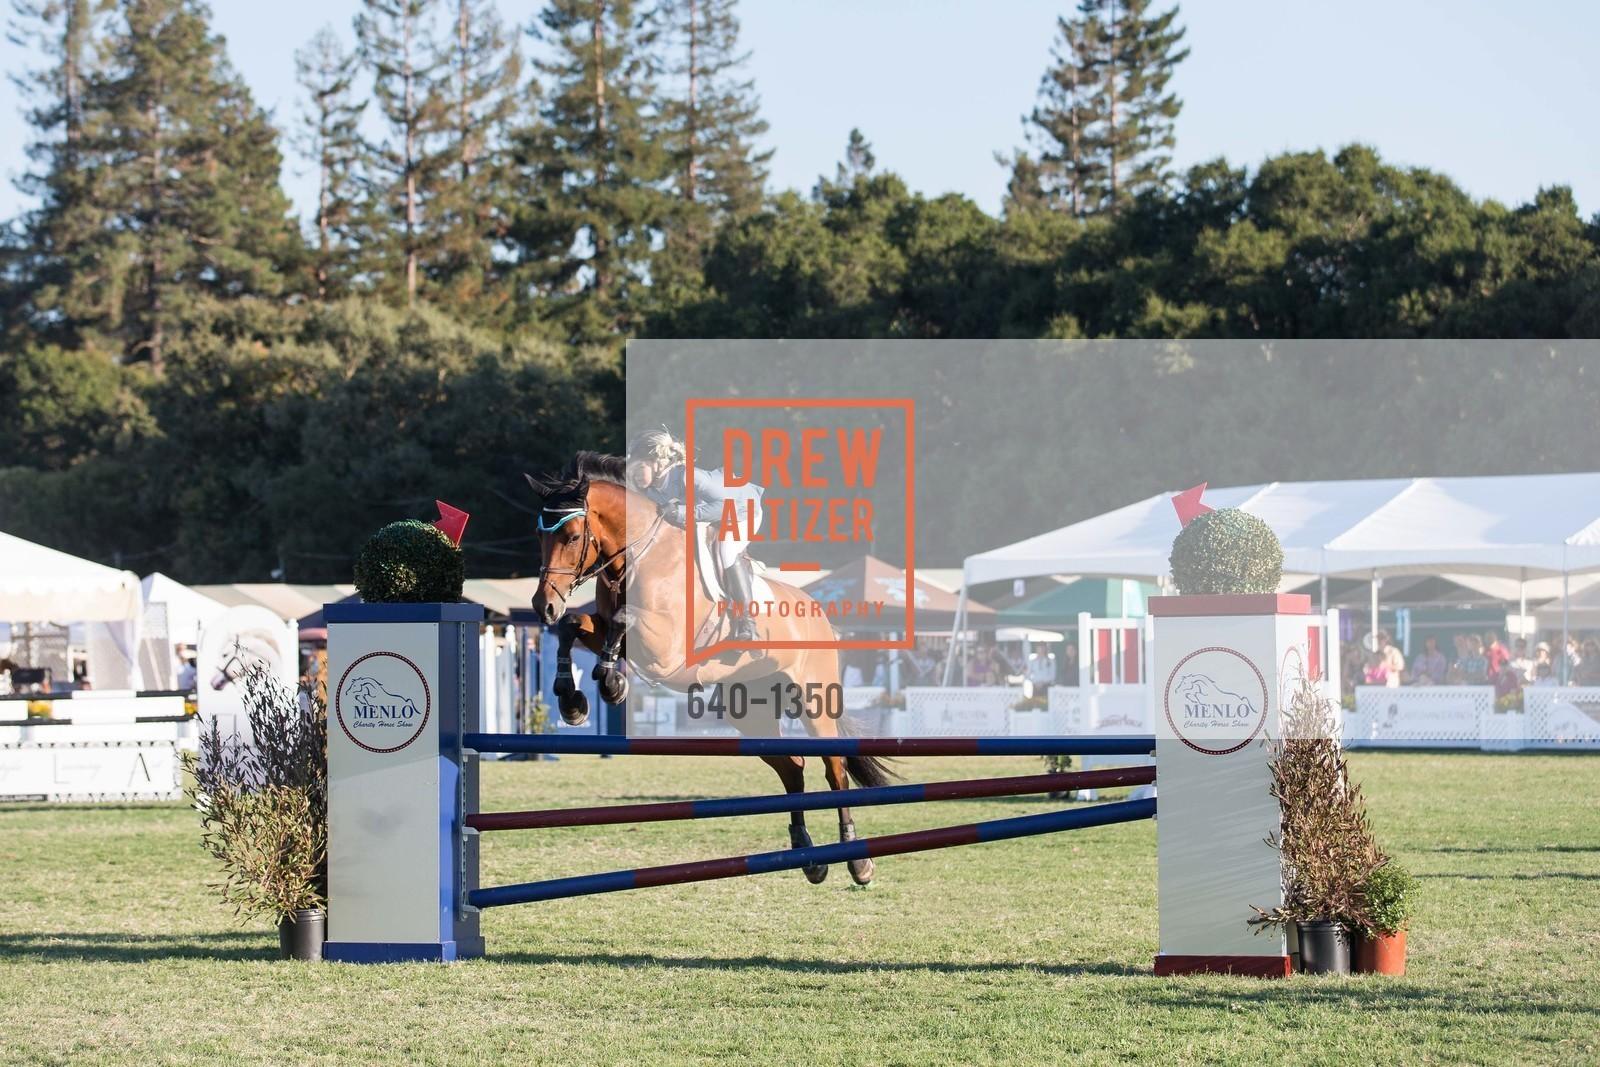 Horse Show, Photo #640-1350